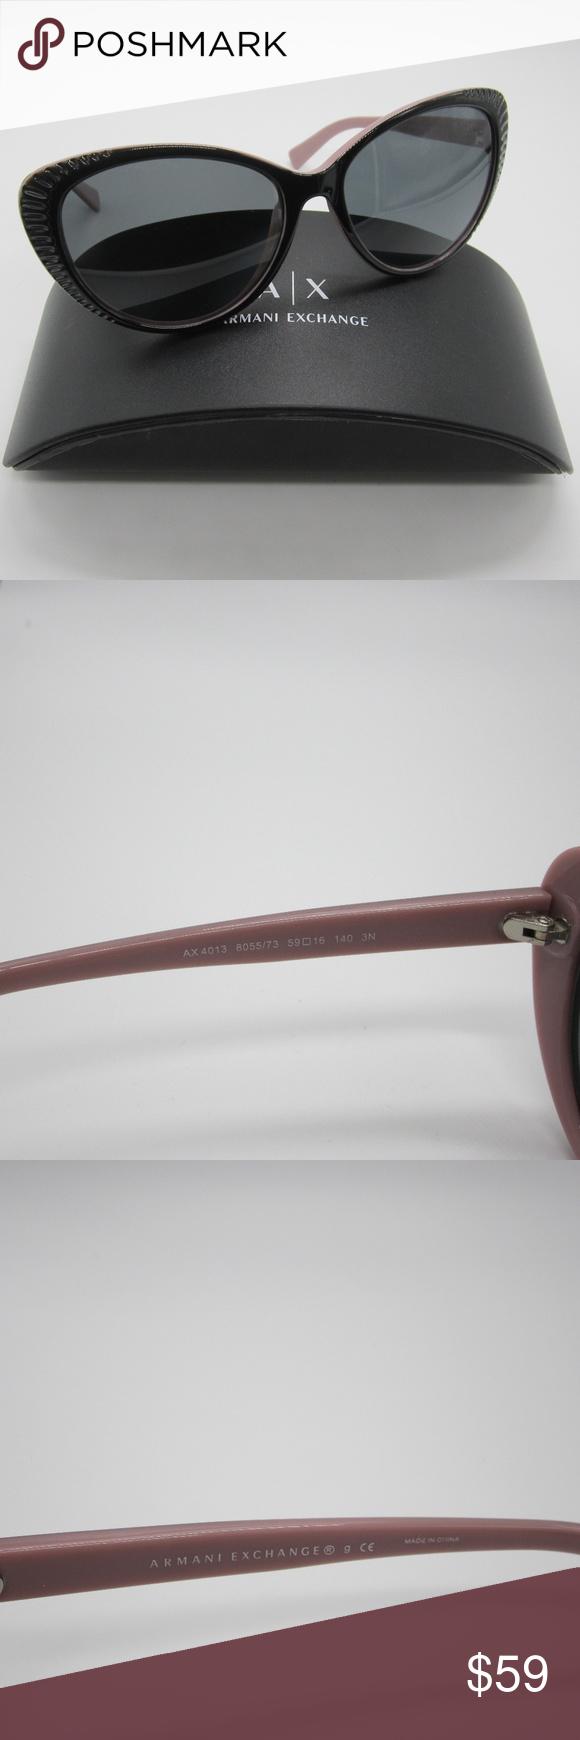 2d33cf41b989 Armani Exchange Ax 150 S Aviator Sunglasses - Restaurant and Palinka Bar